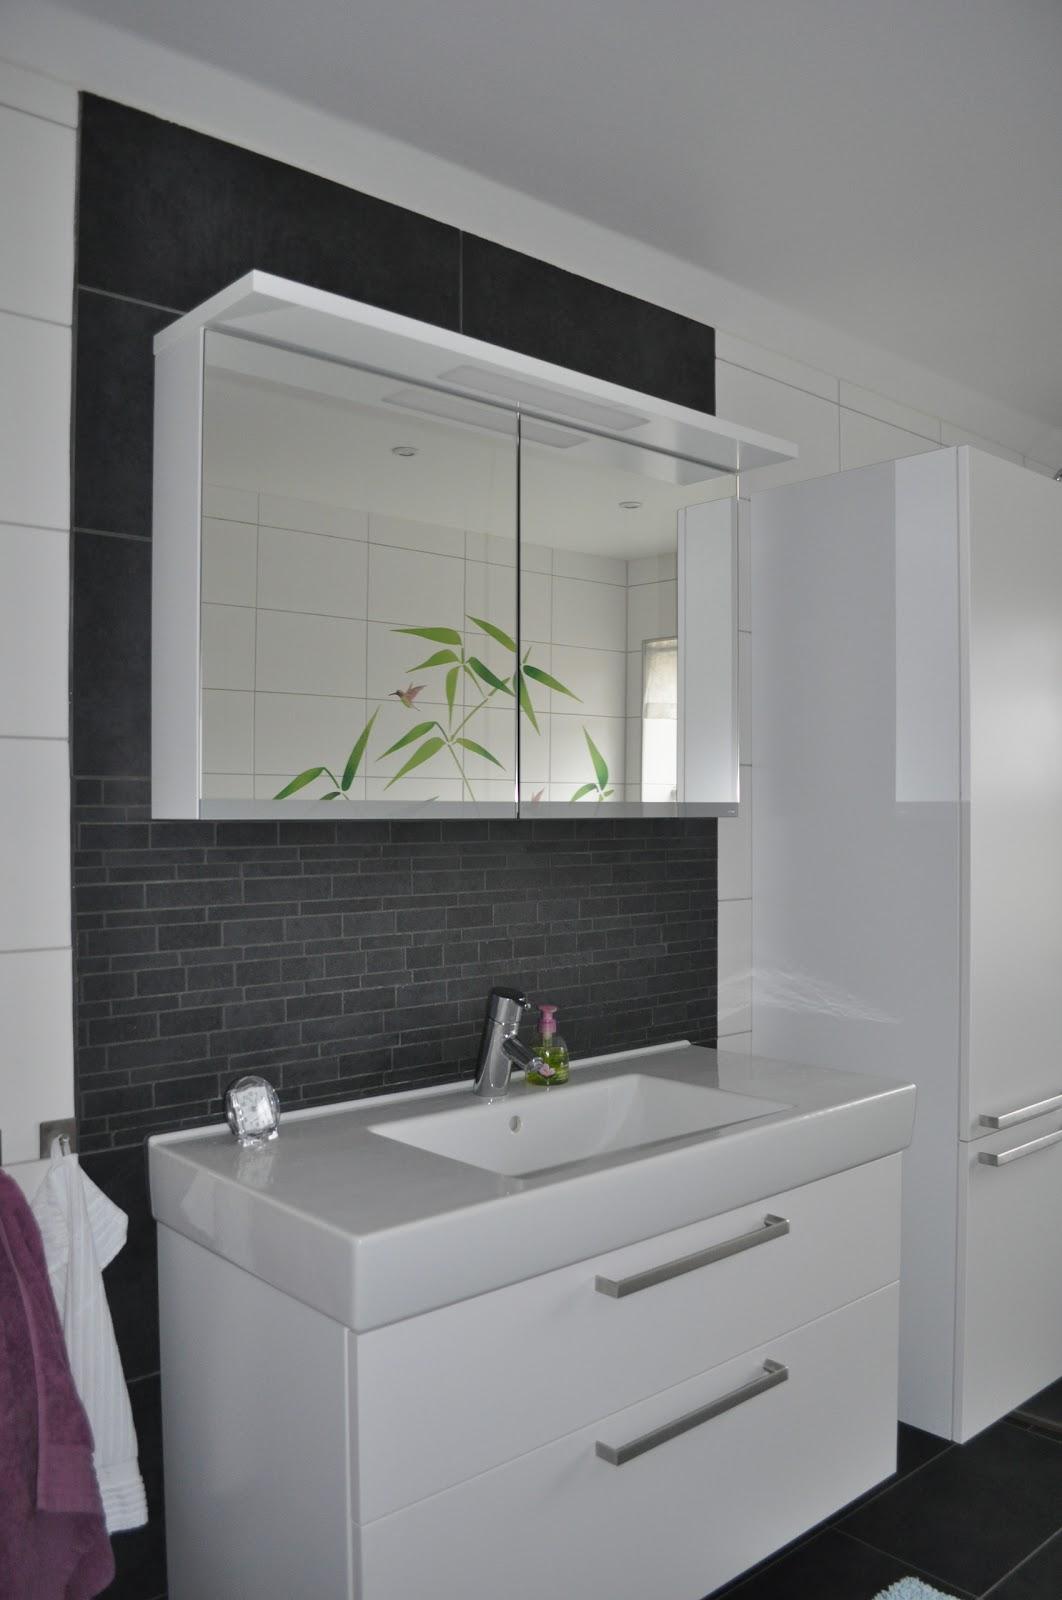 Badrum nytt badrum : Uffes Bygg: Nytt badrum!